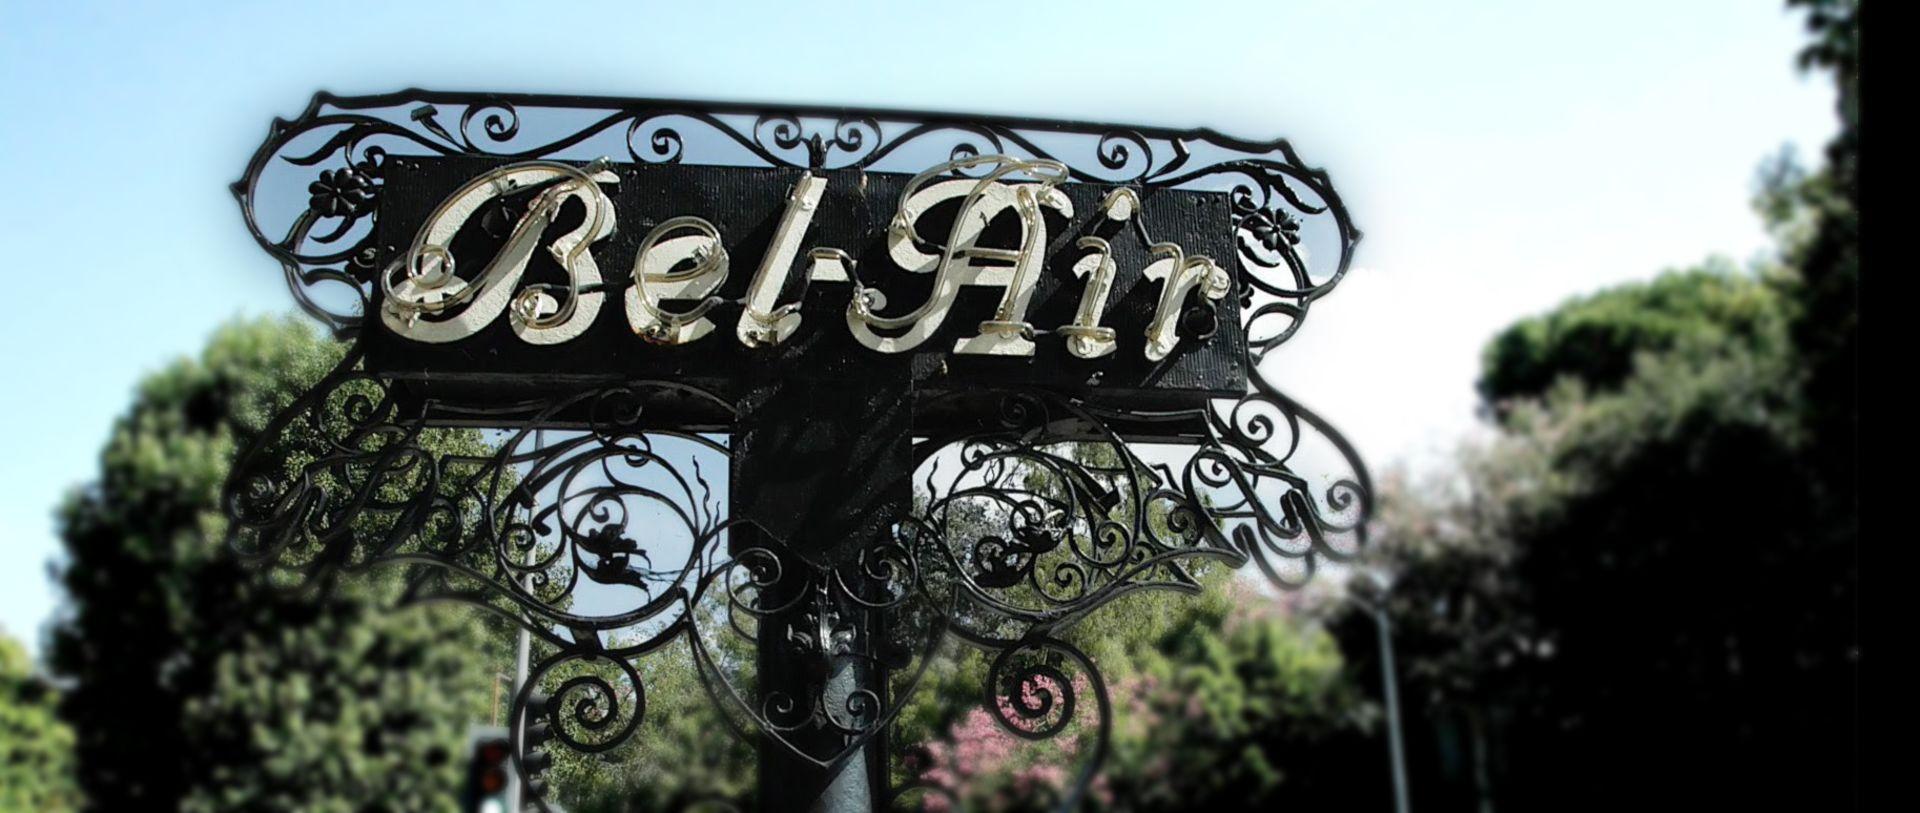 Bel Air/Holmby Hills